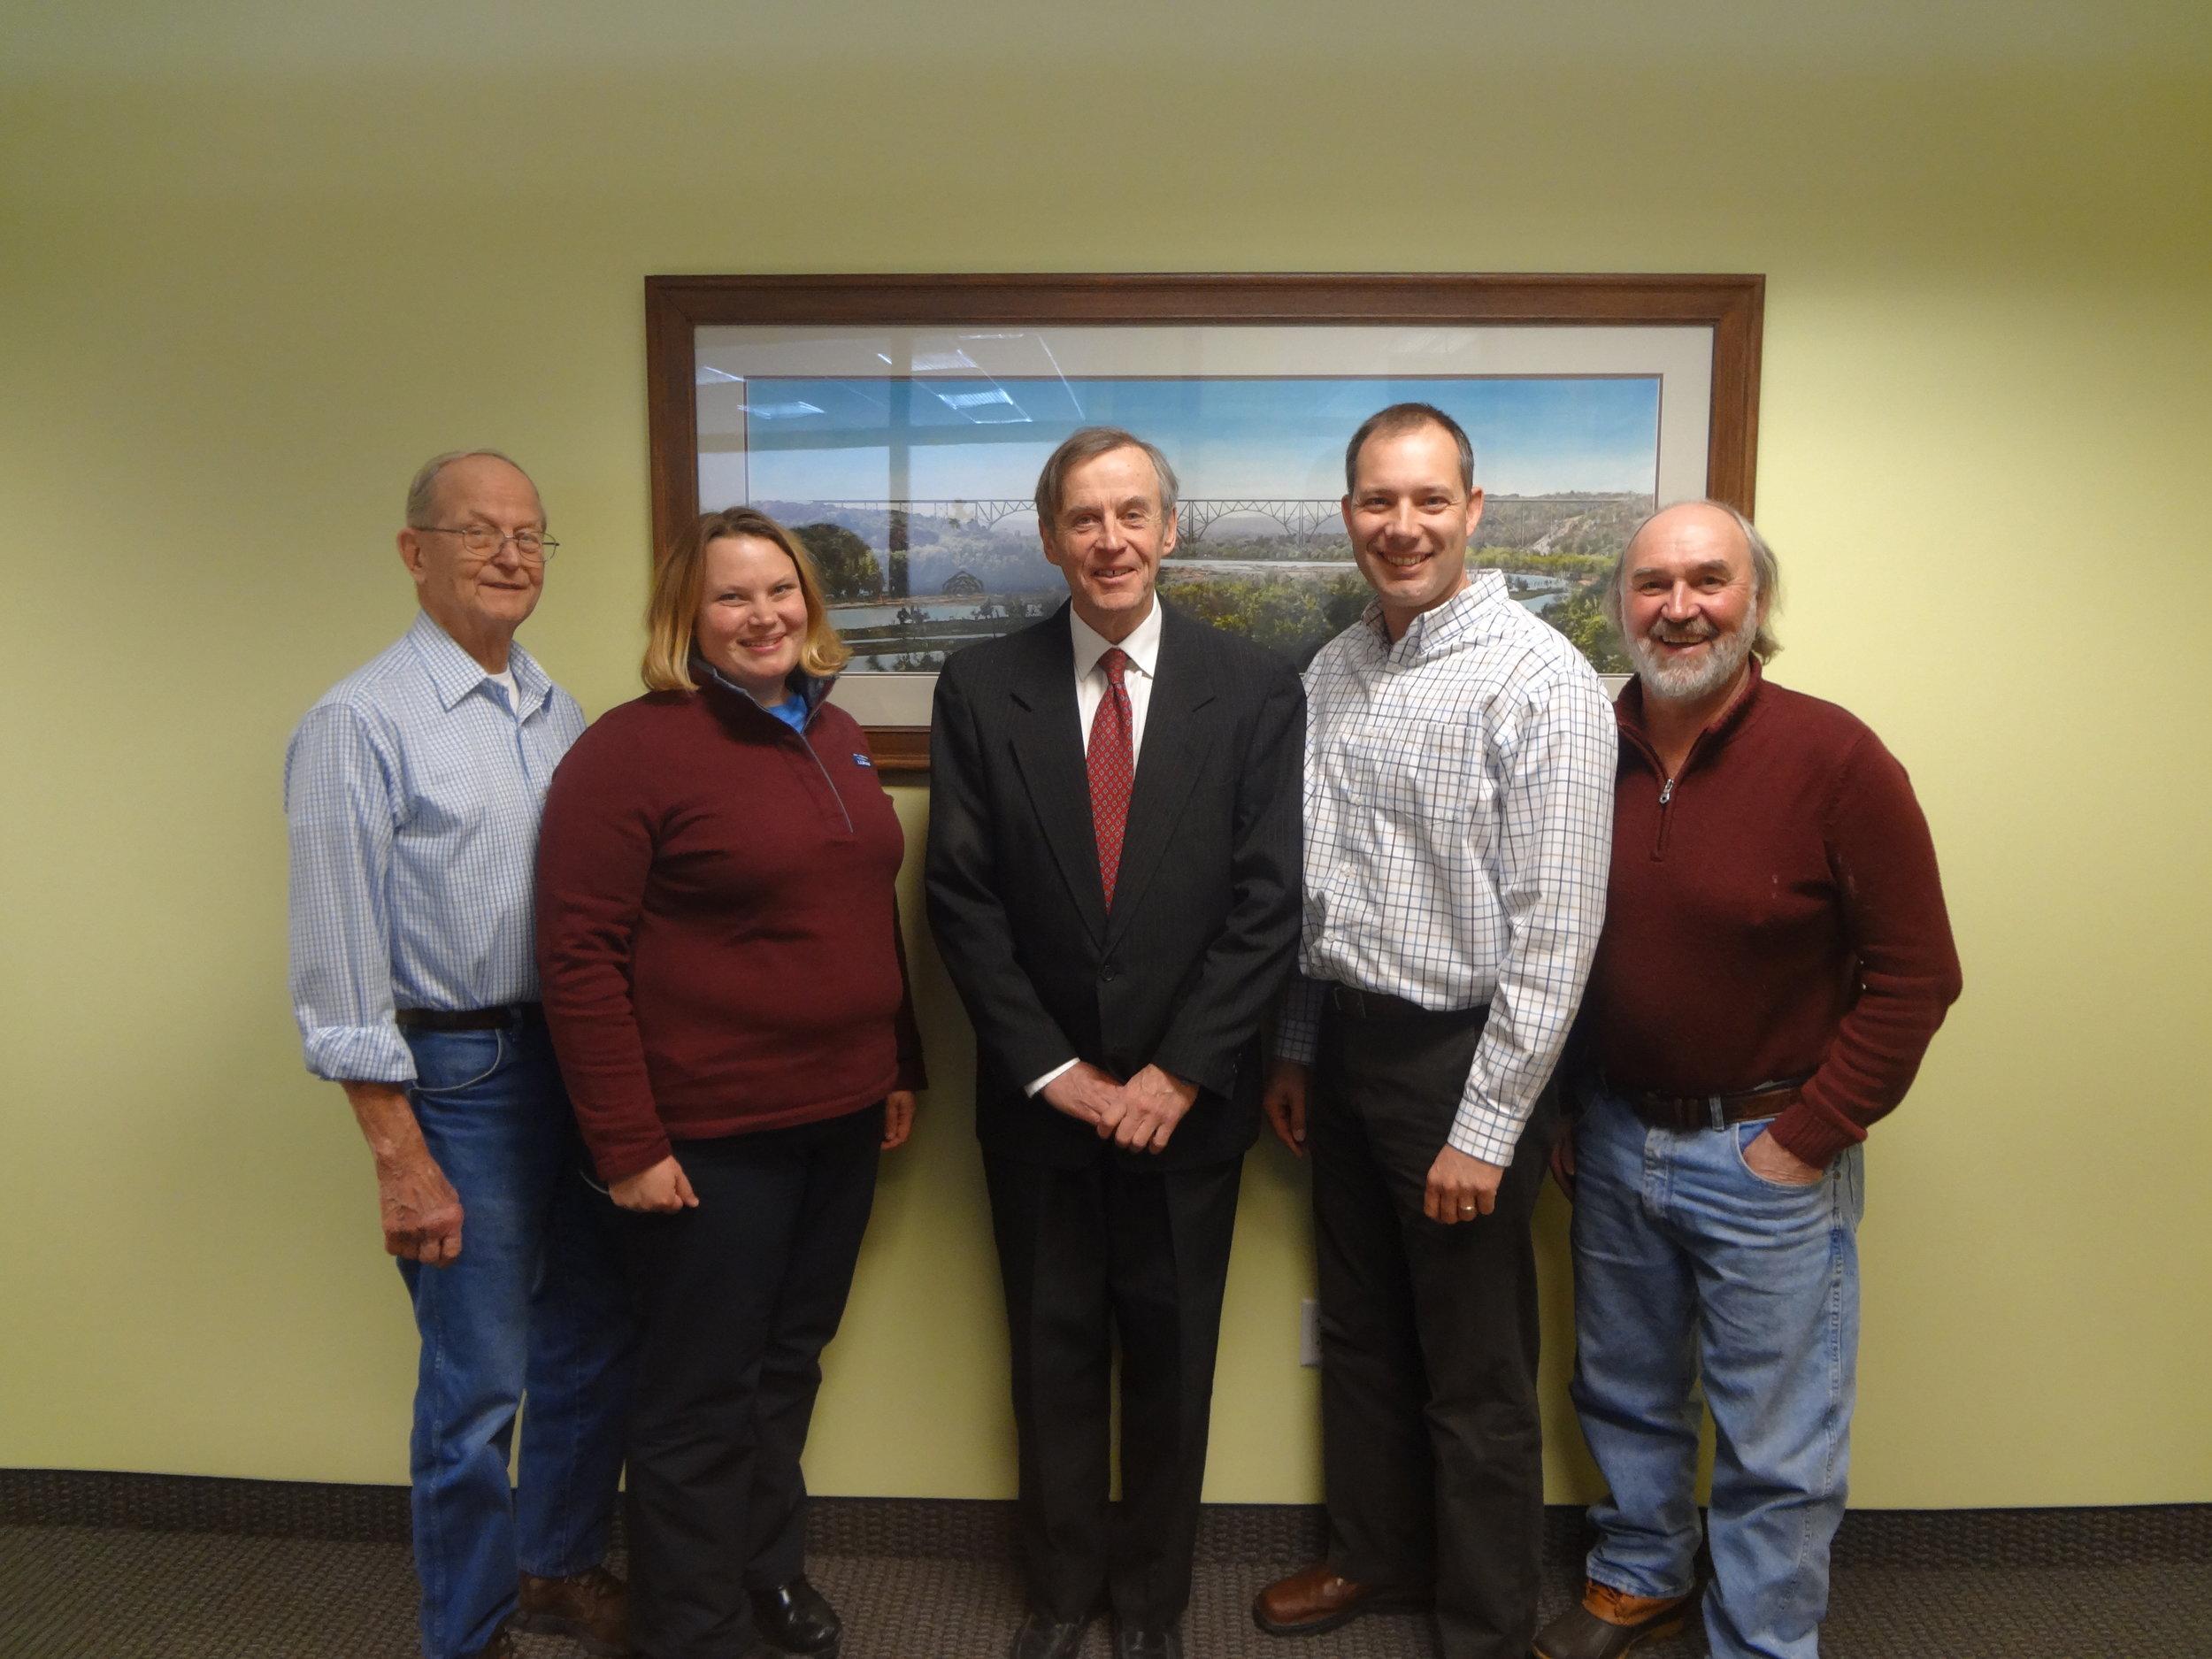 From Left to Right: Bob Rosenquist, Diane Blake, John Rheinberger, Jim Levitt, and Tim Behrends